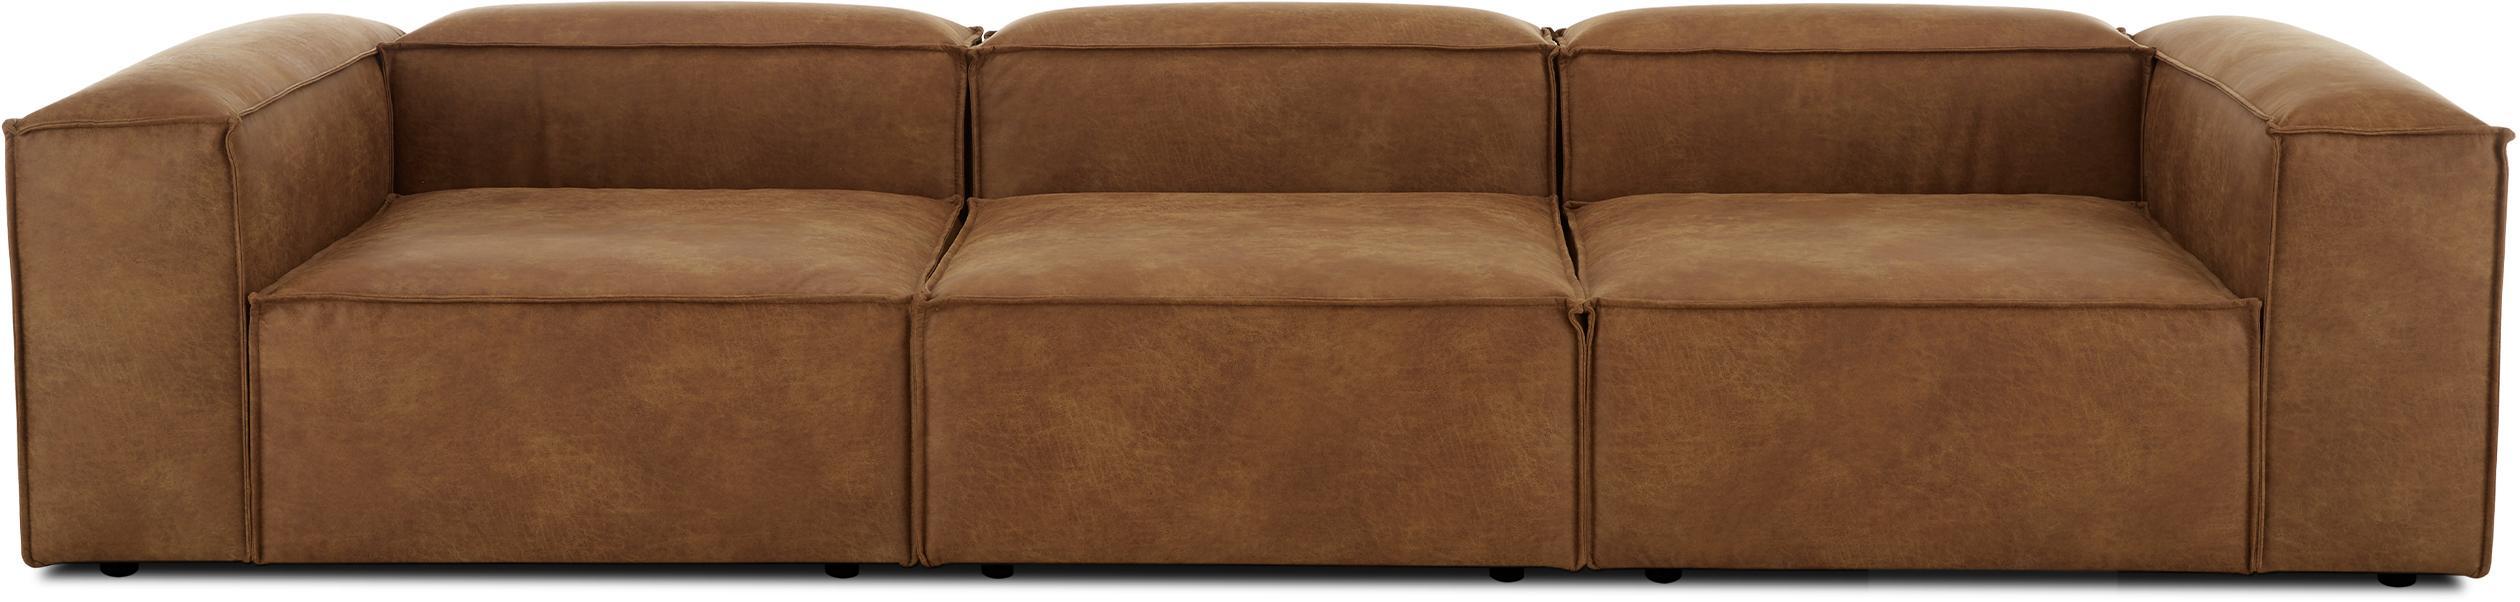 Modulares Leder-Sofa Lennon (4-Sitzer), Bezug: Recyceltes Leder (70% Led, Gestell: Massives Kiefernholz, Spe, Leder Braun, B 326 x T 119 cm